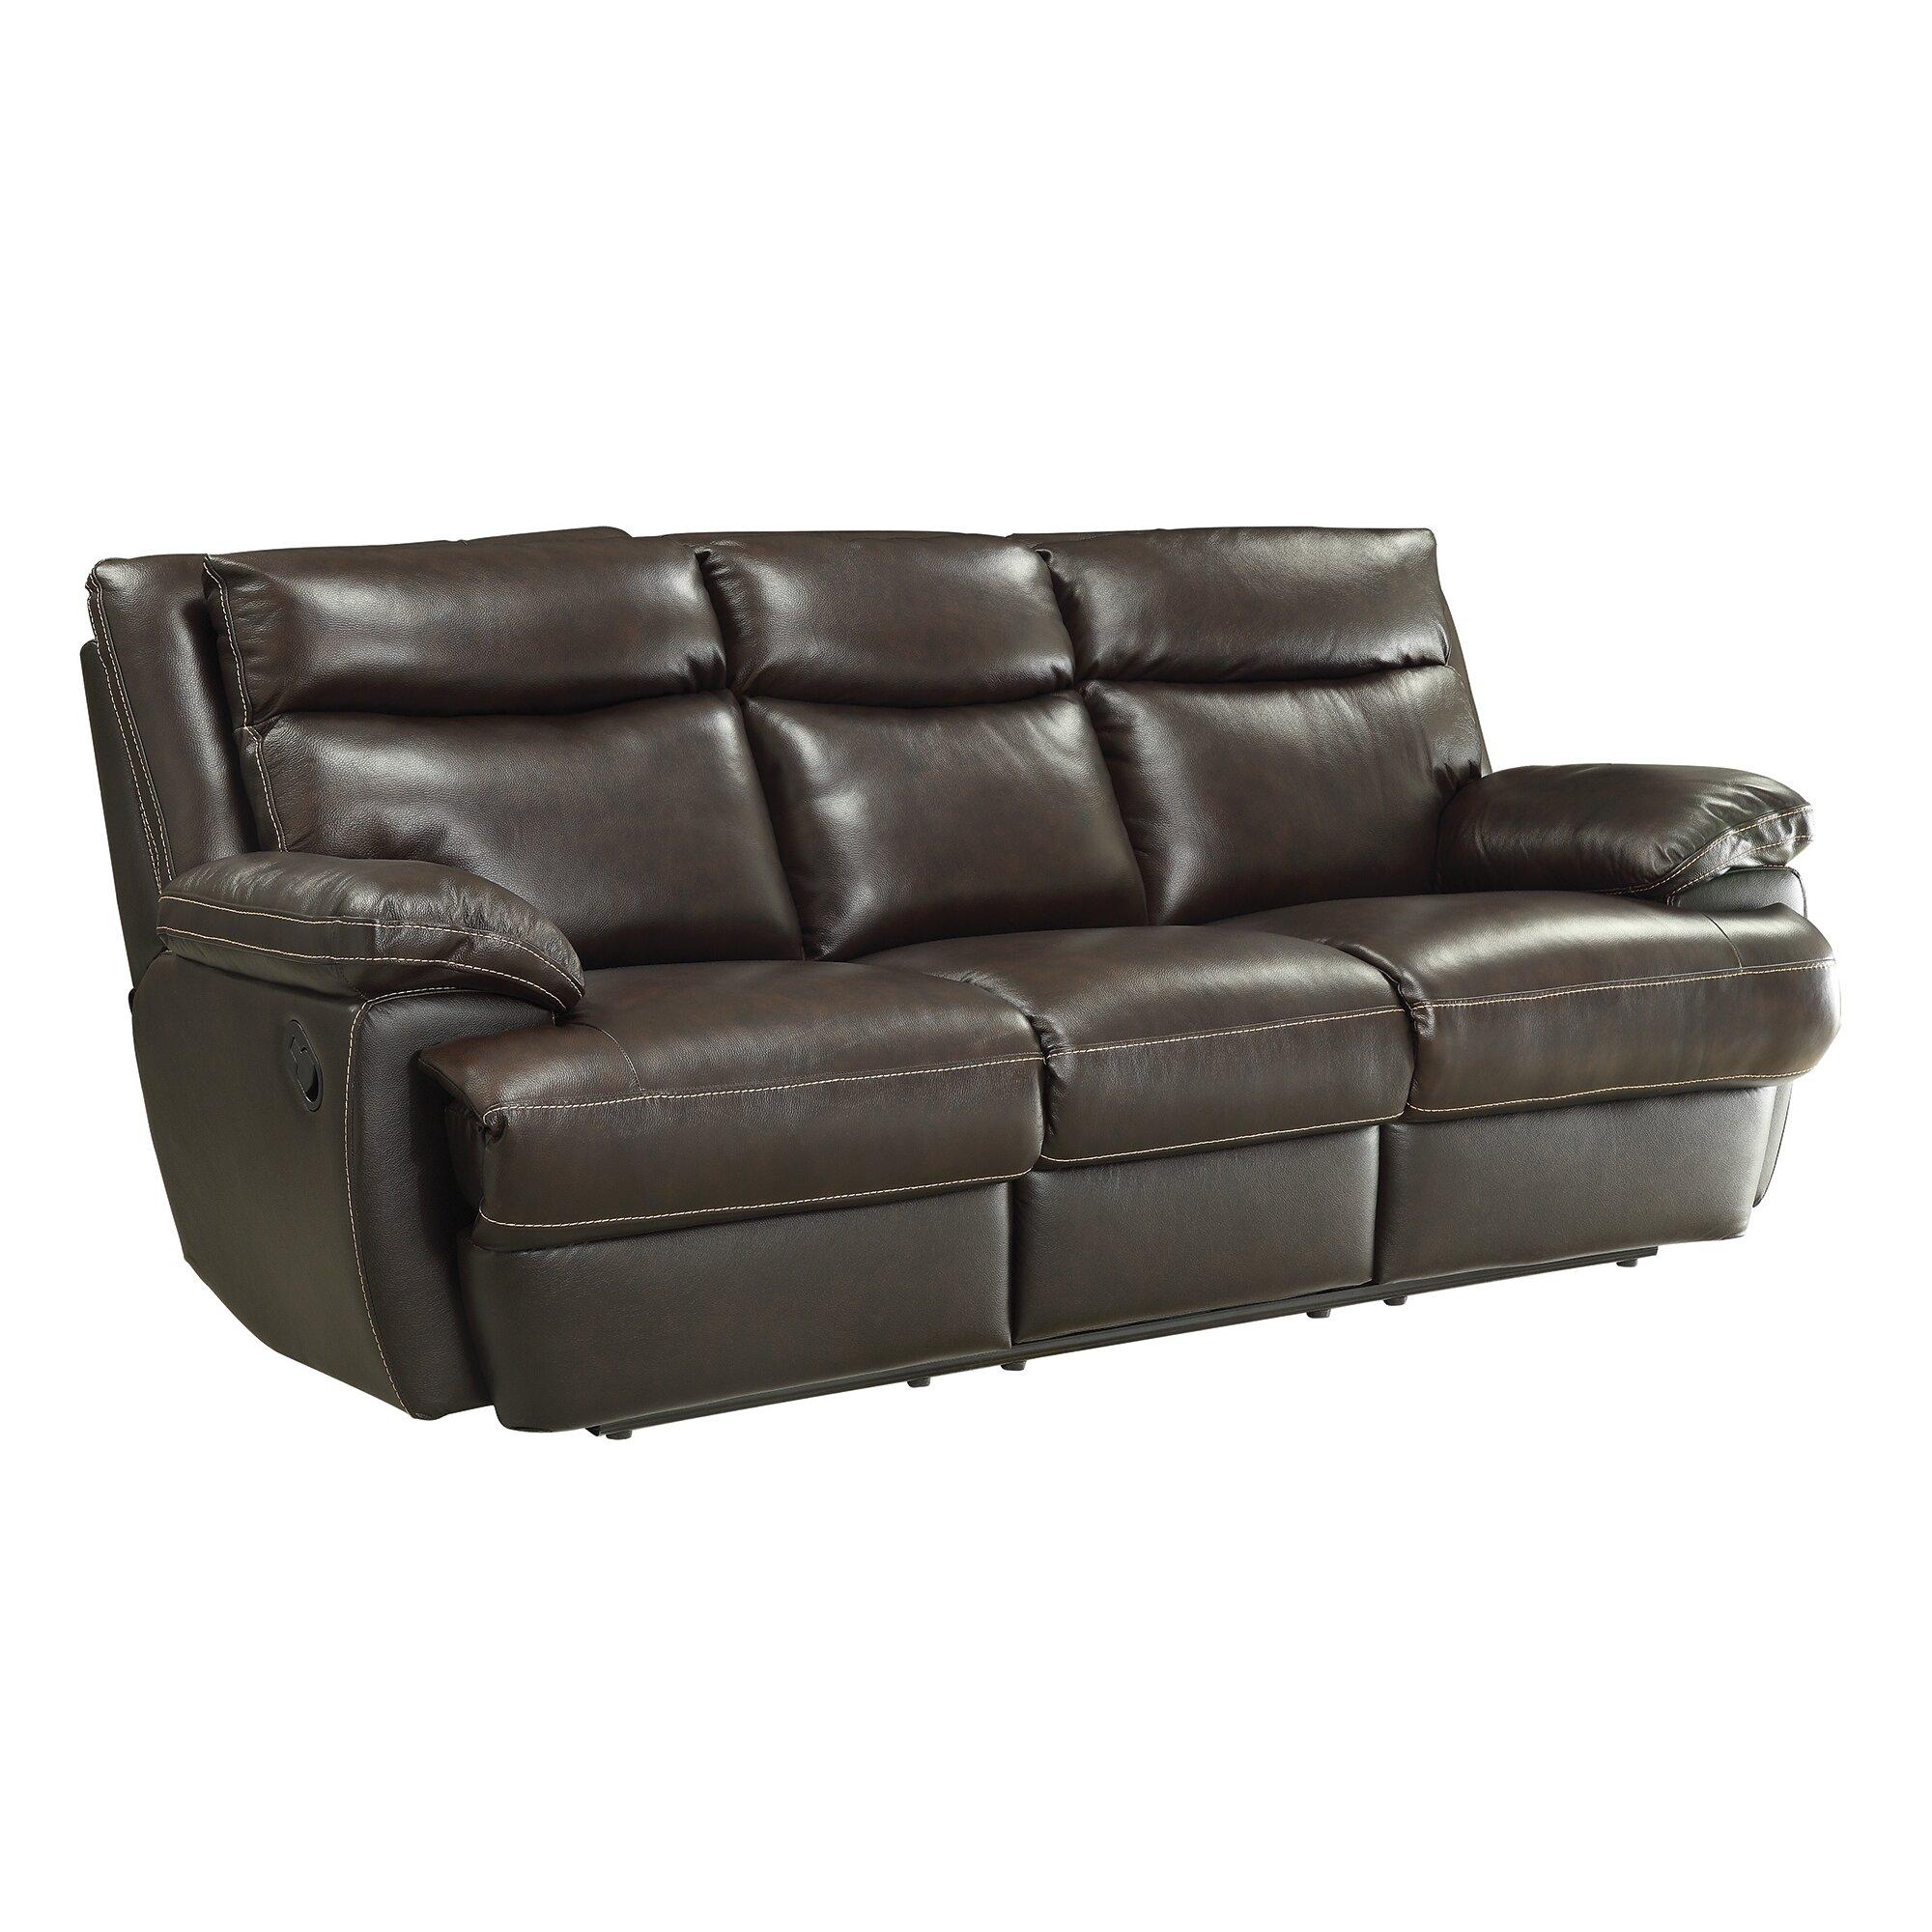 Wildon Home Macpherson Motion Leather Reclining Sofa